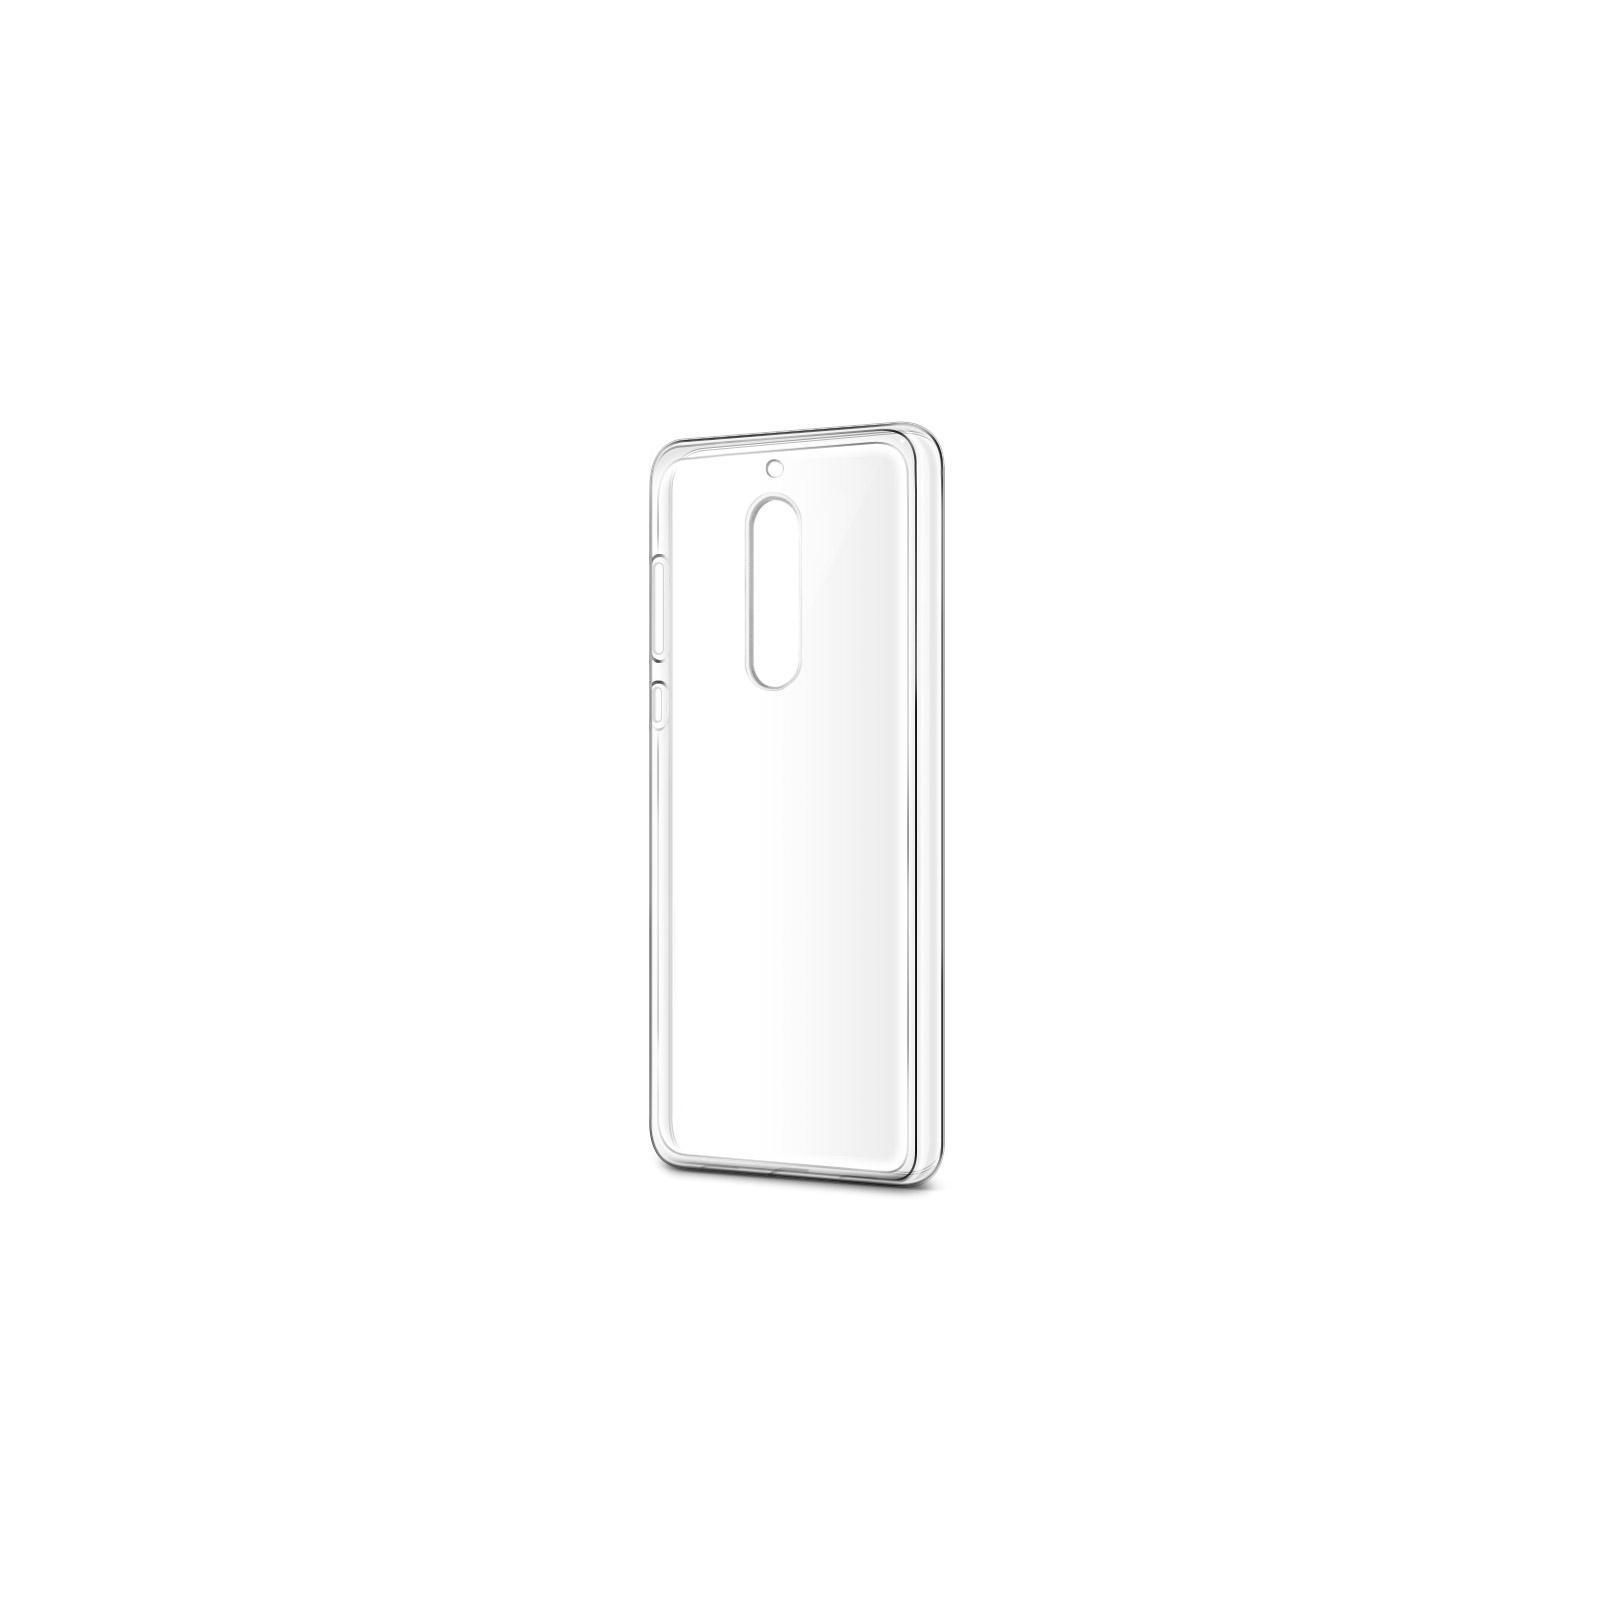 Чехол для моб. телефона SmartCase Nokia 3 TPU Clear (SC-N3) изображение 3